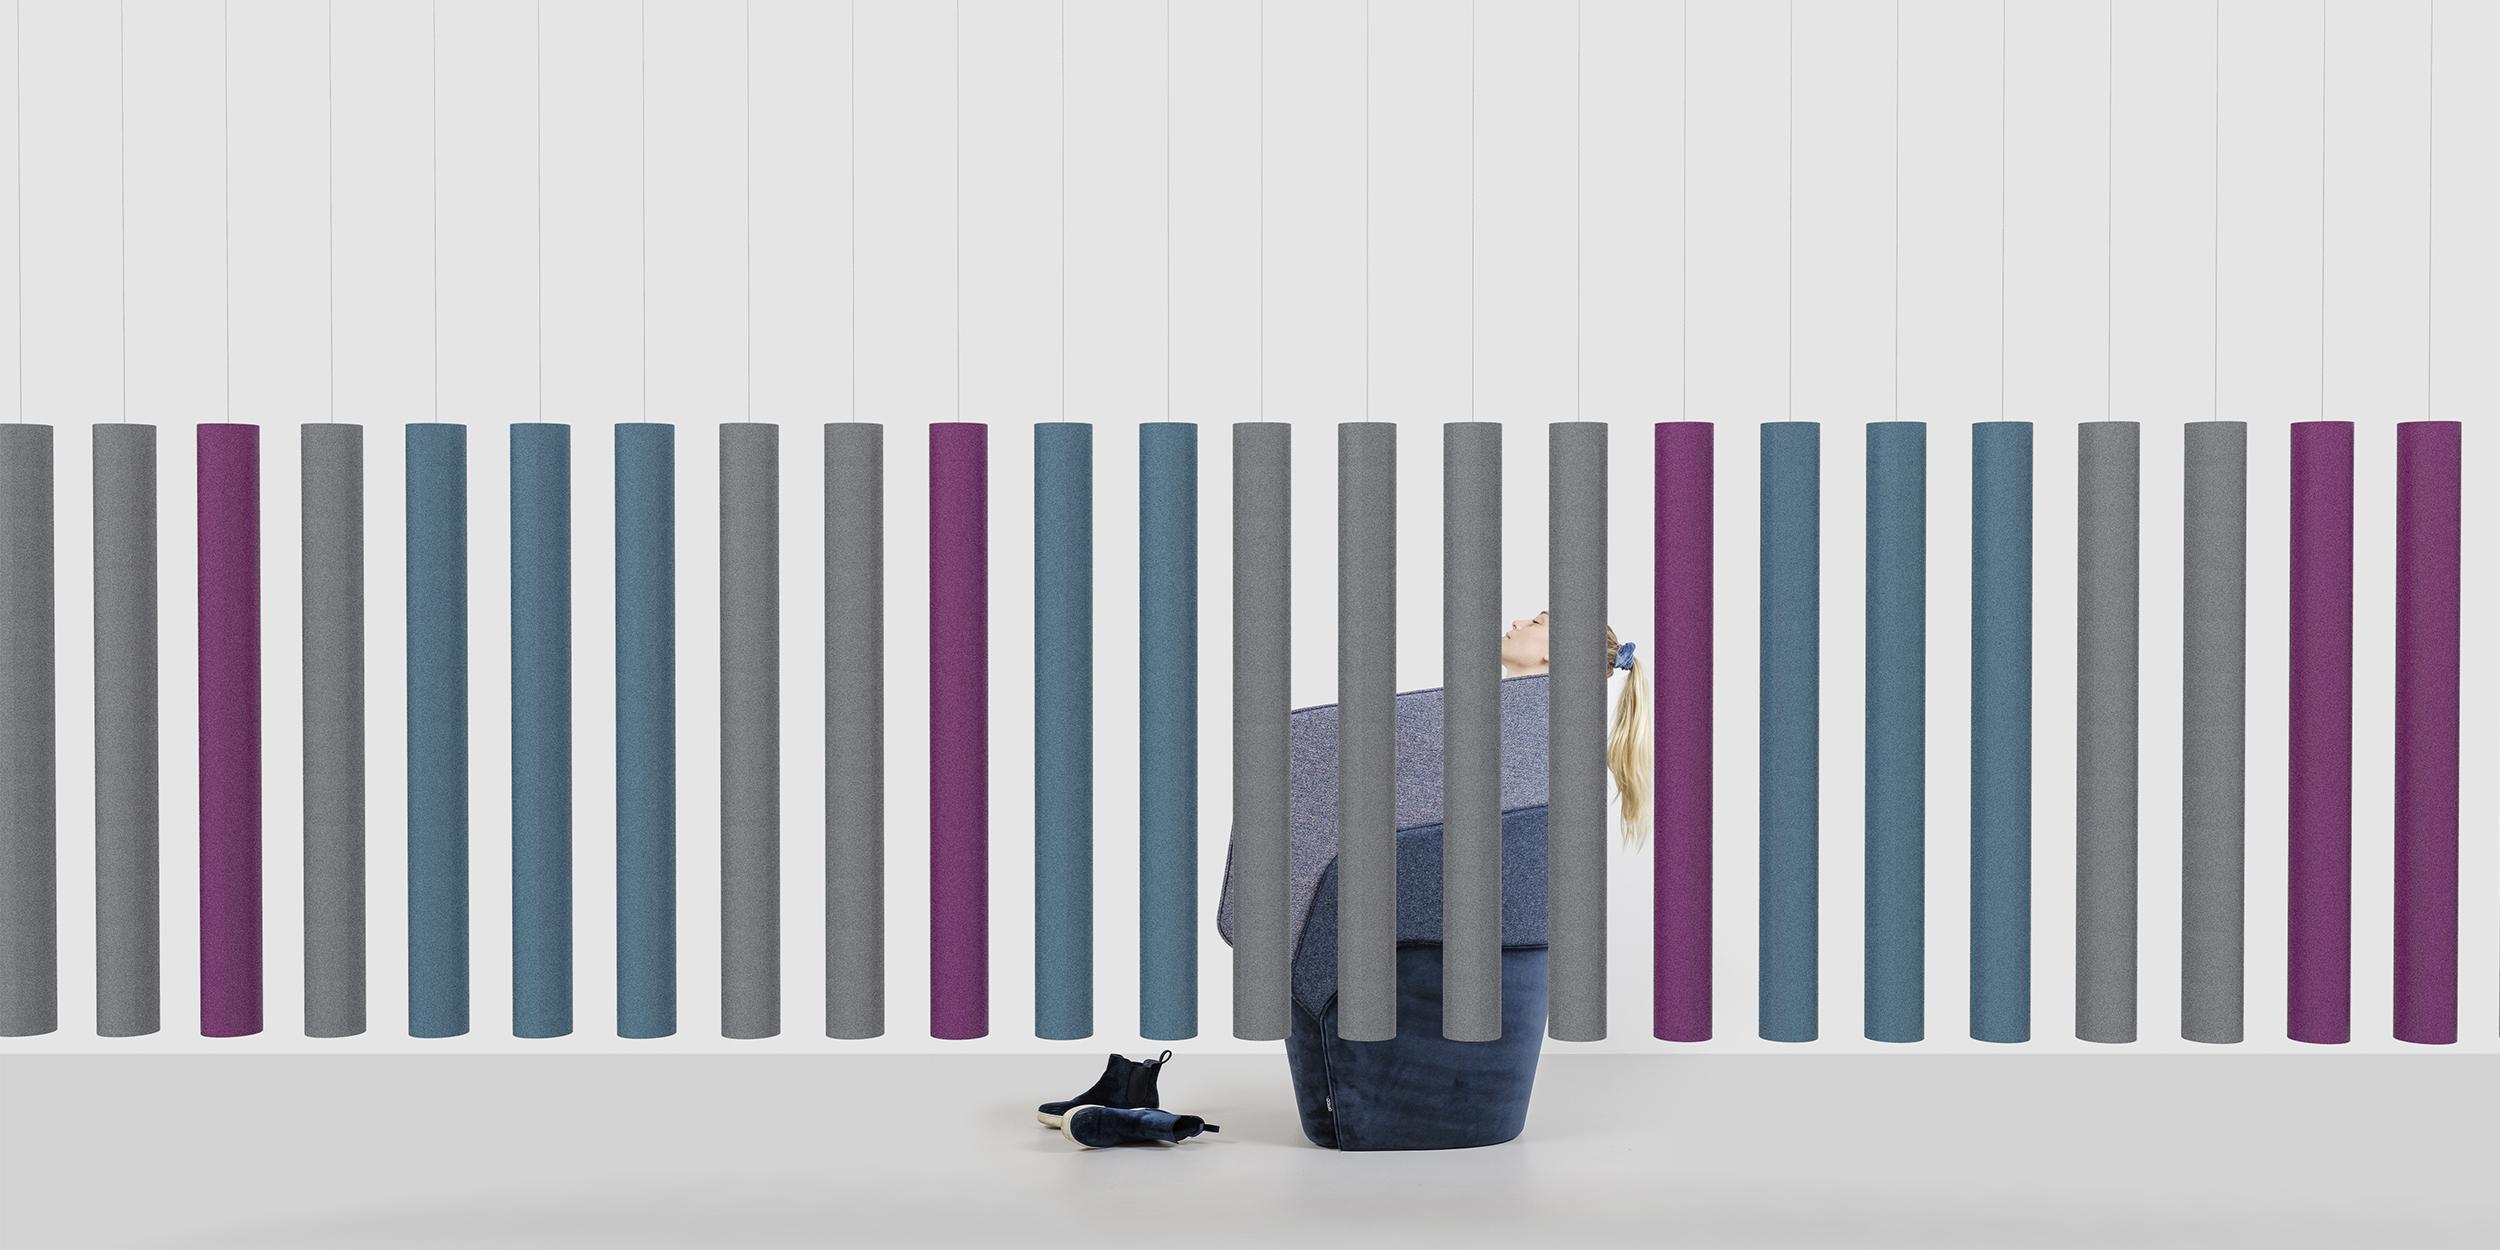 SoundsticksTM, Room divider by Andrea Ruggiero